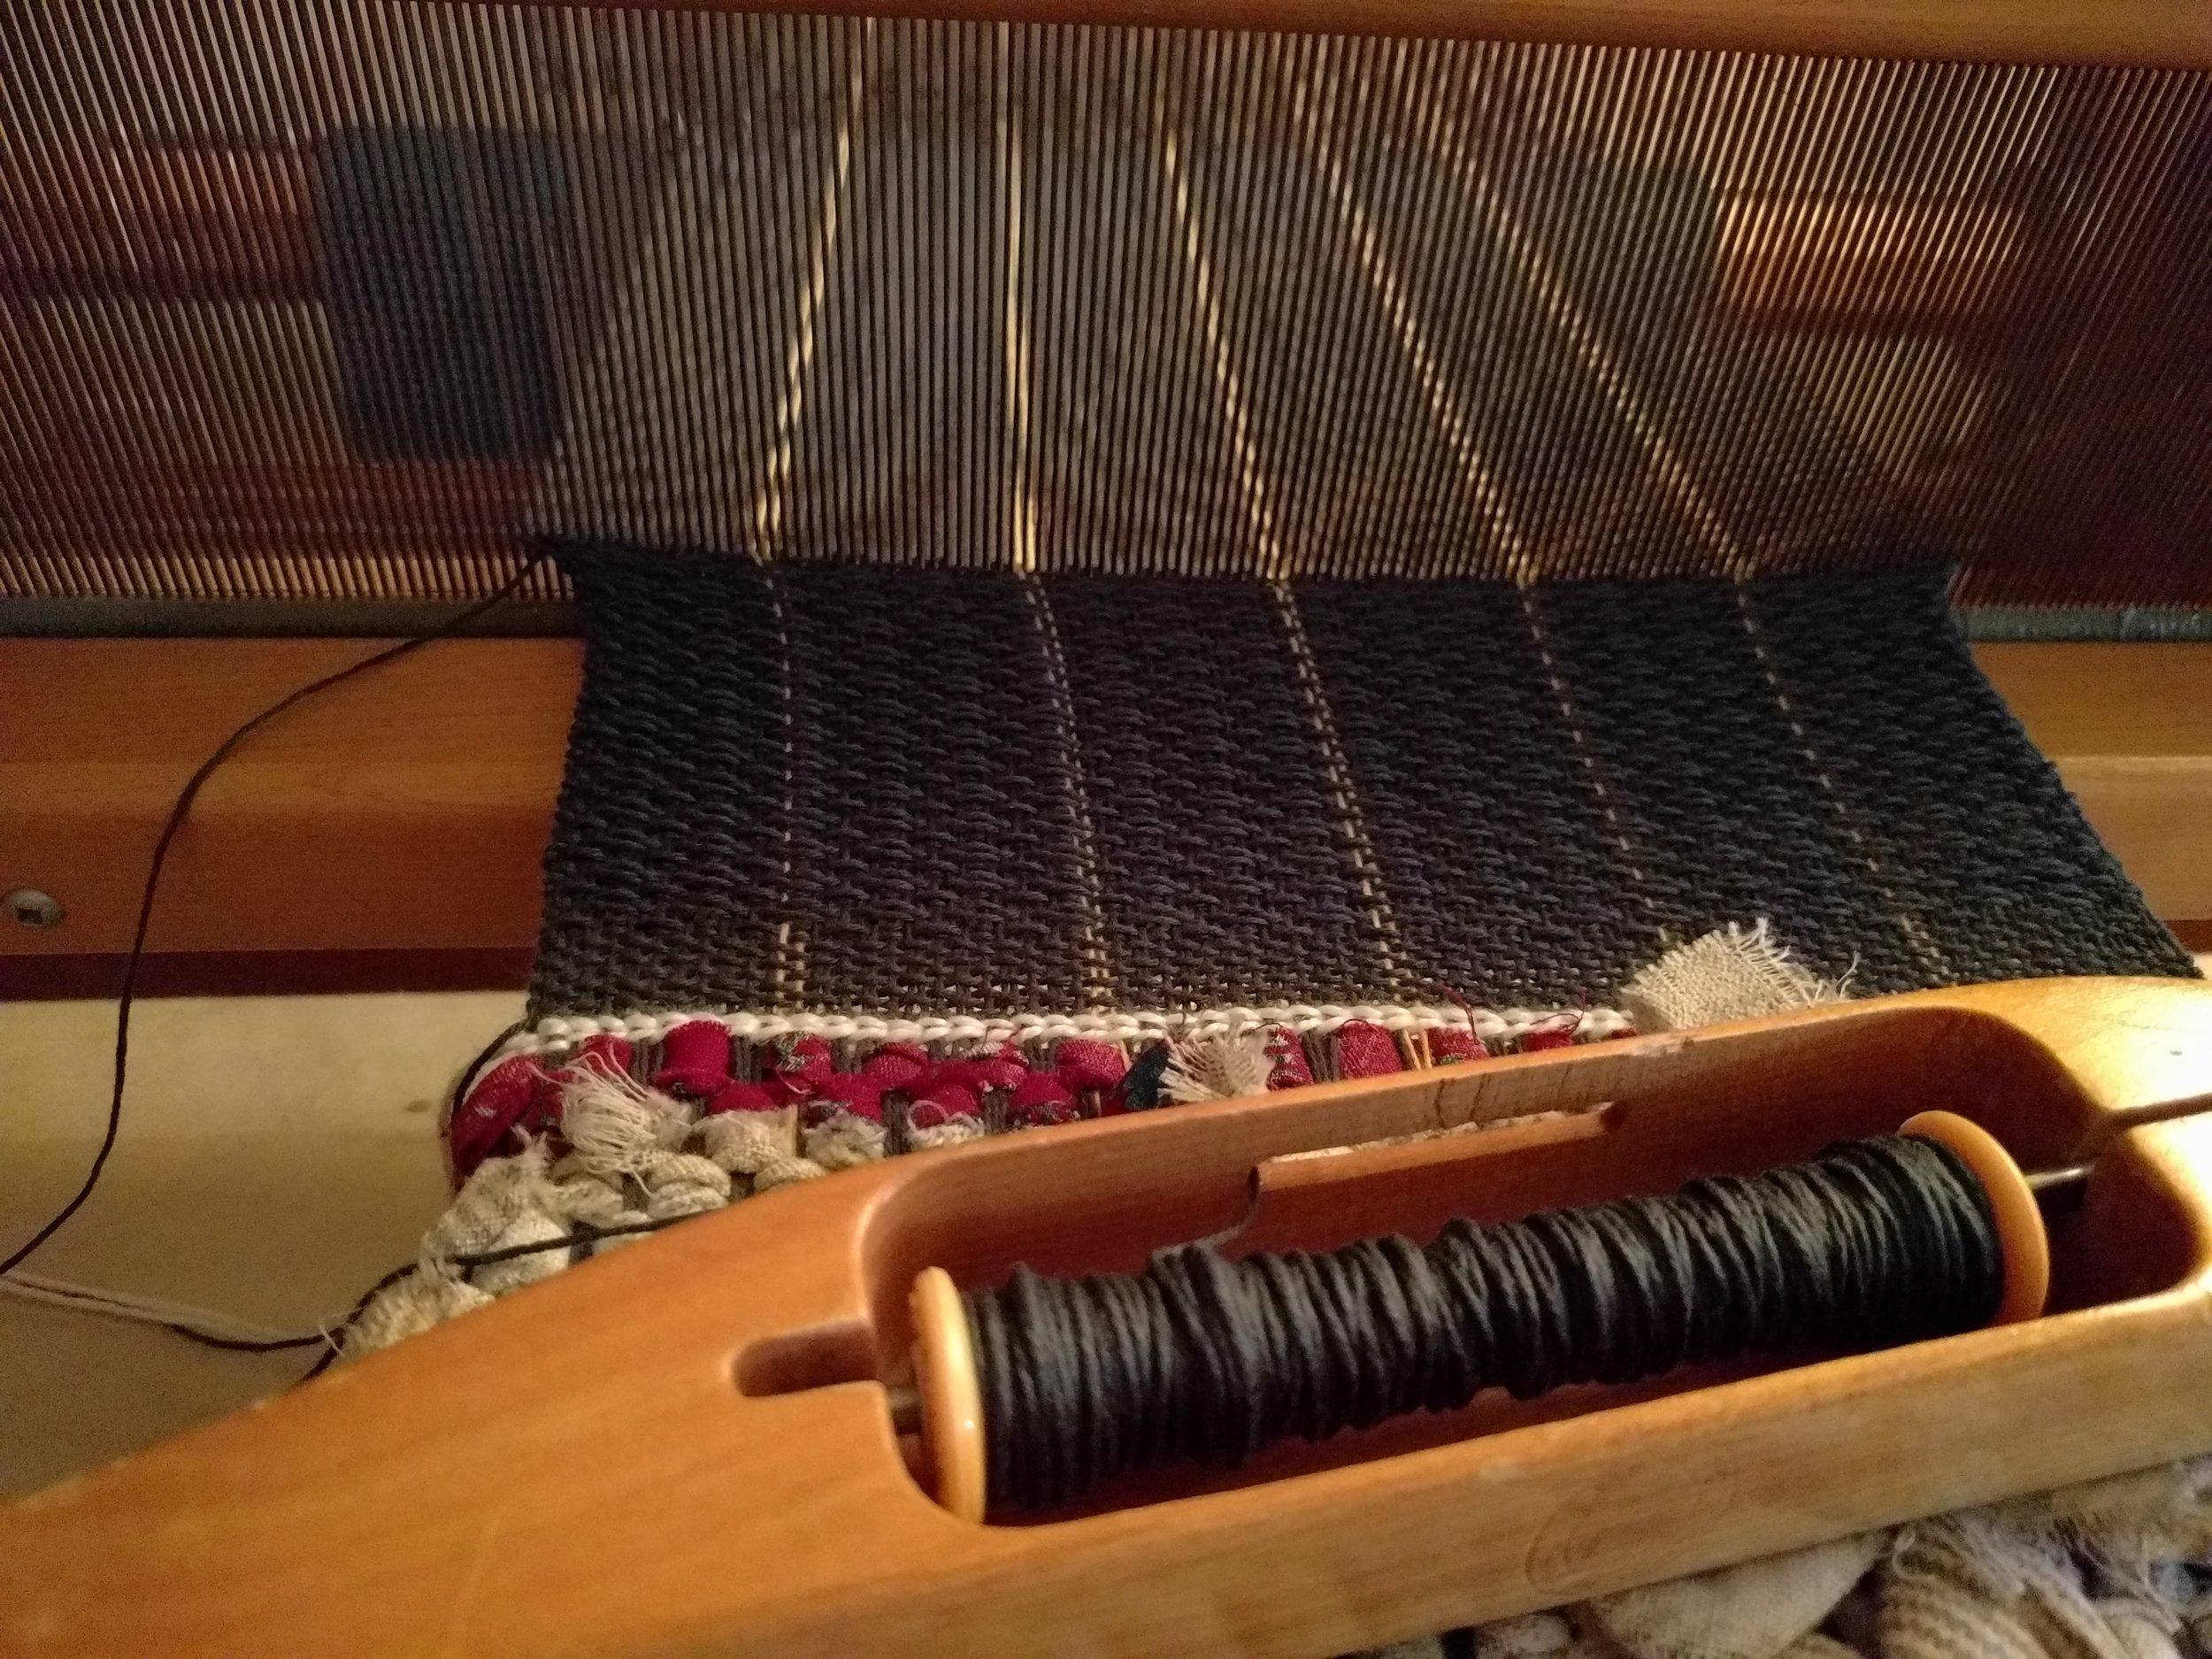 timbers-scarf03.jpg